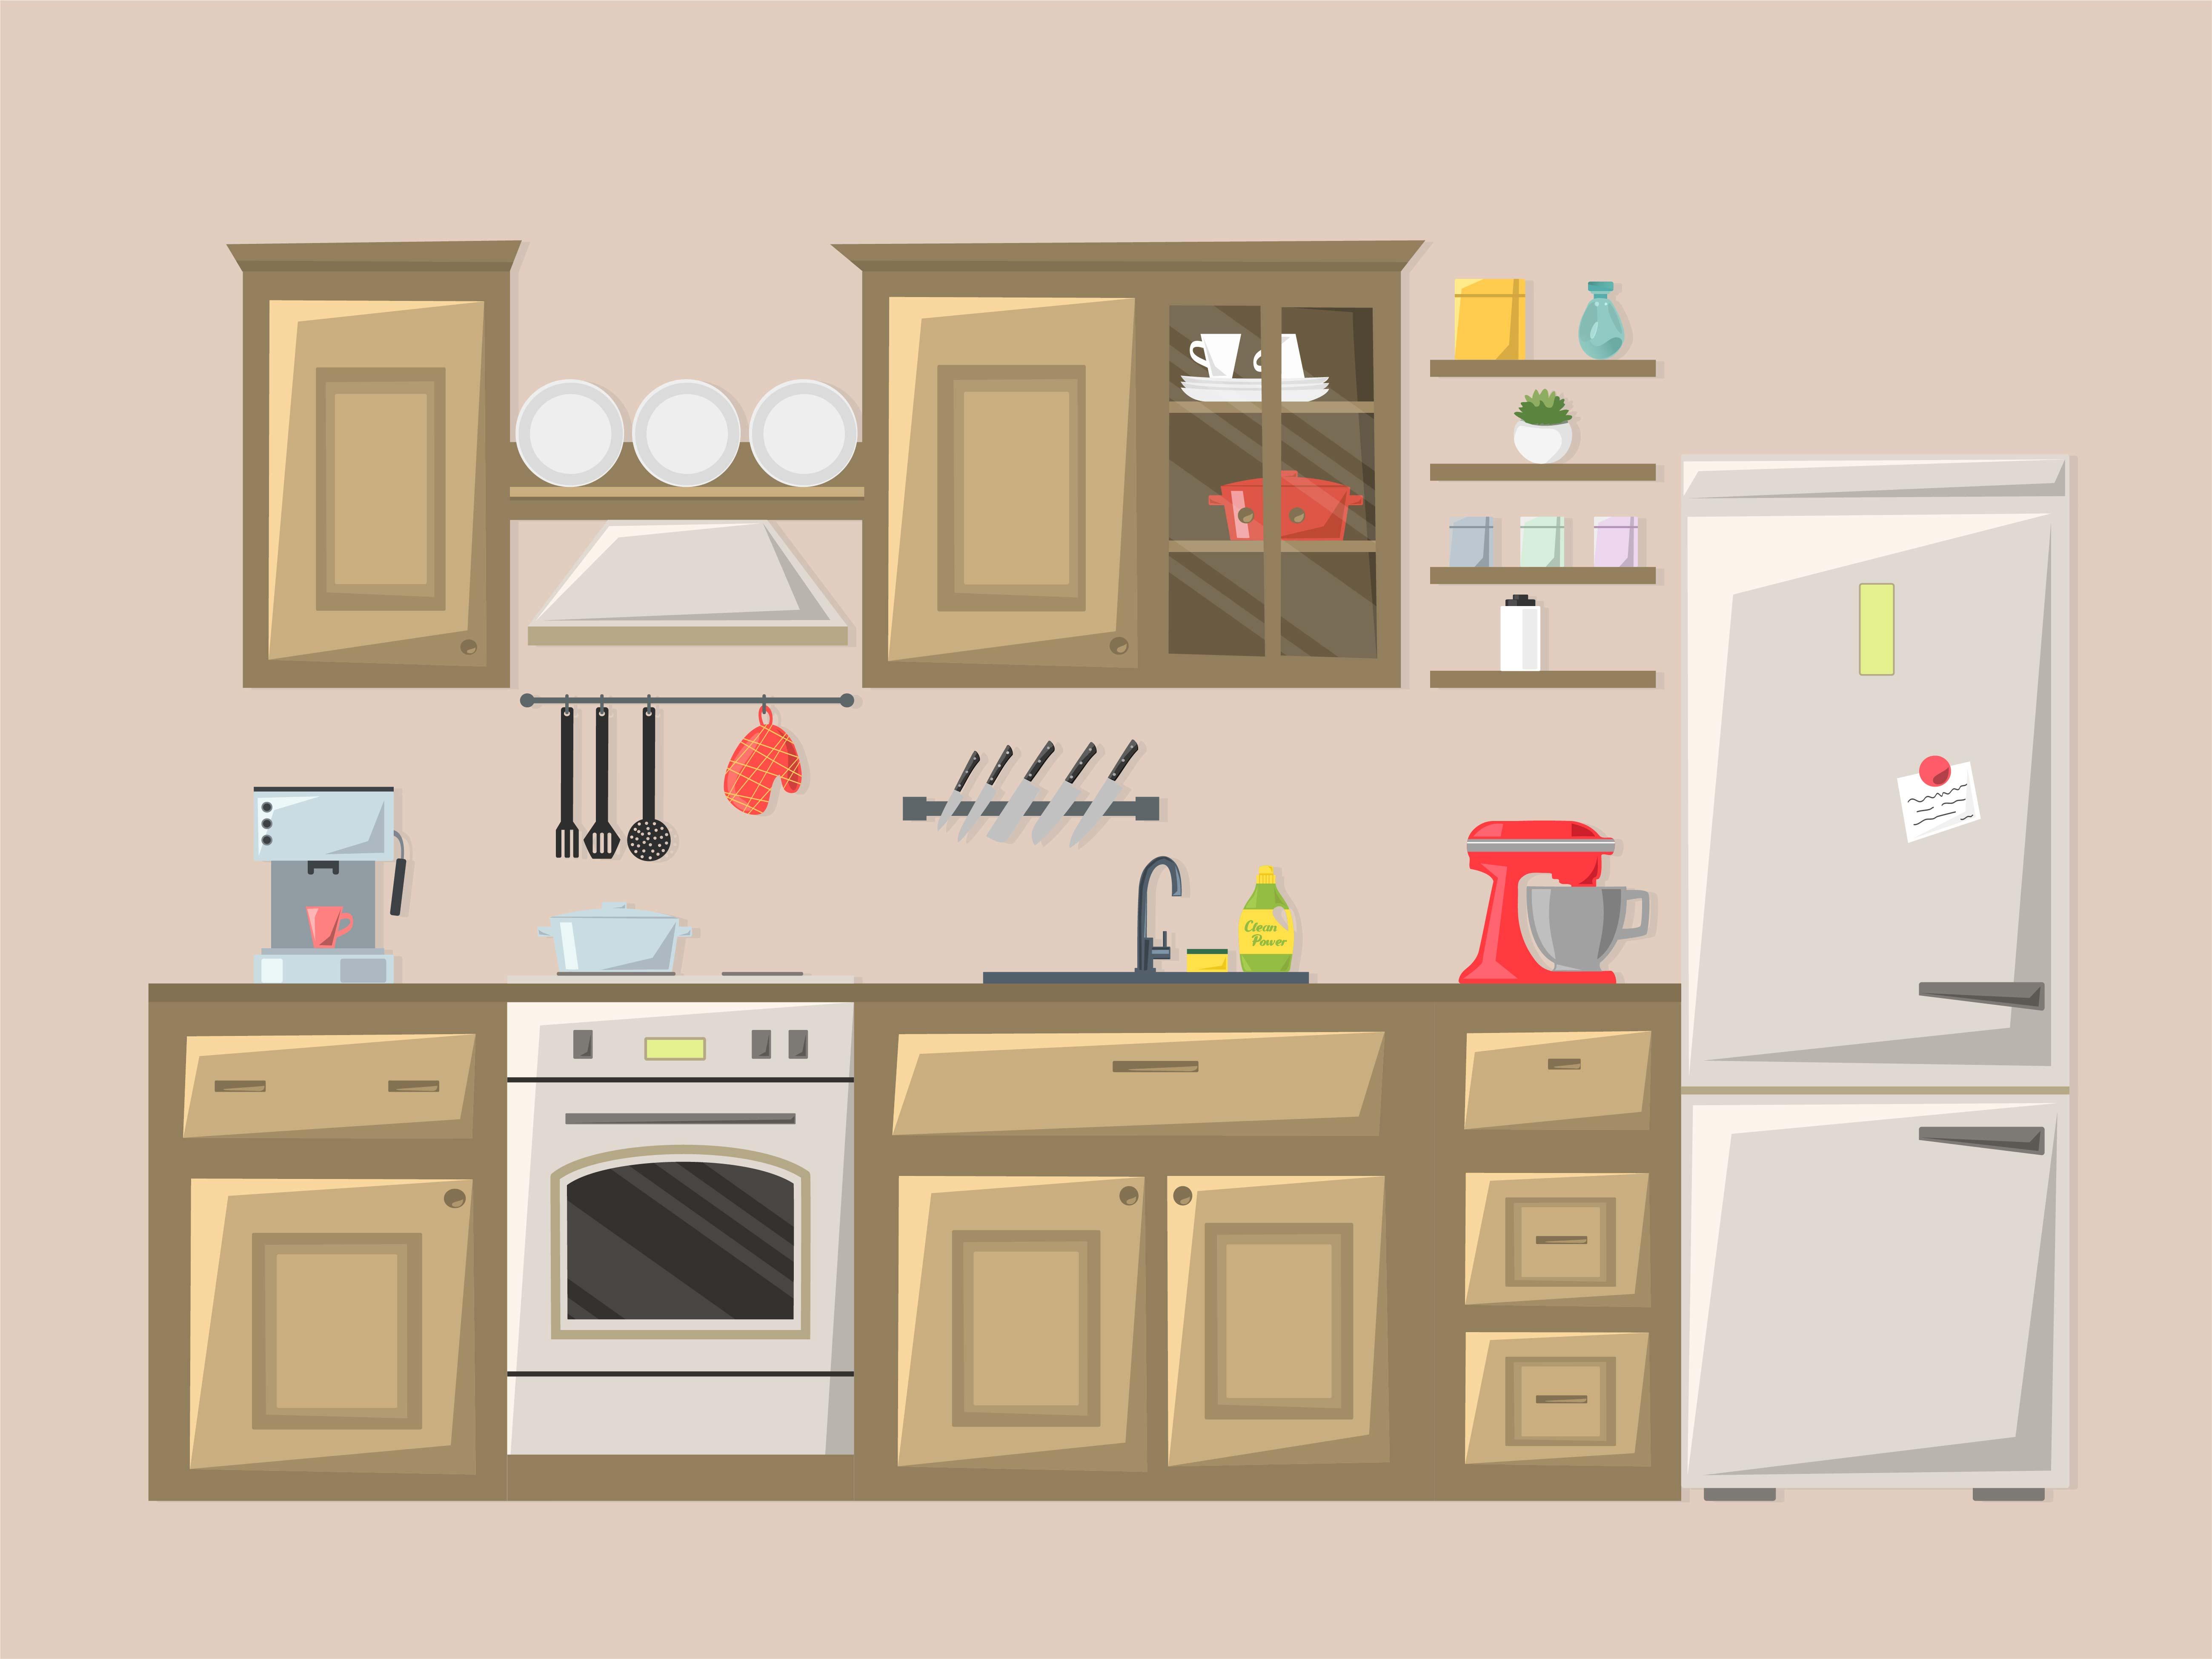 Küche Interieur. Vektor-Illustration - Download Kostenlos Vector